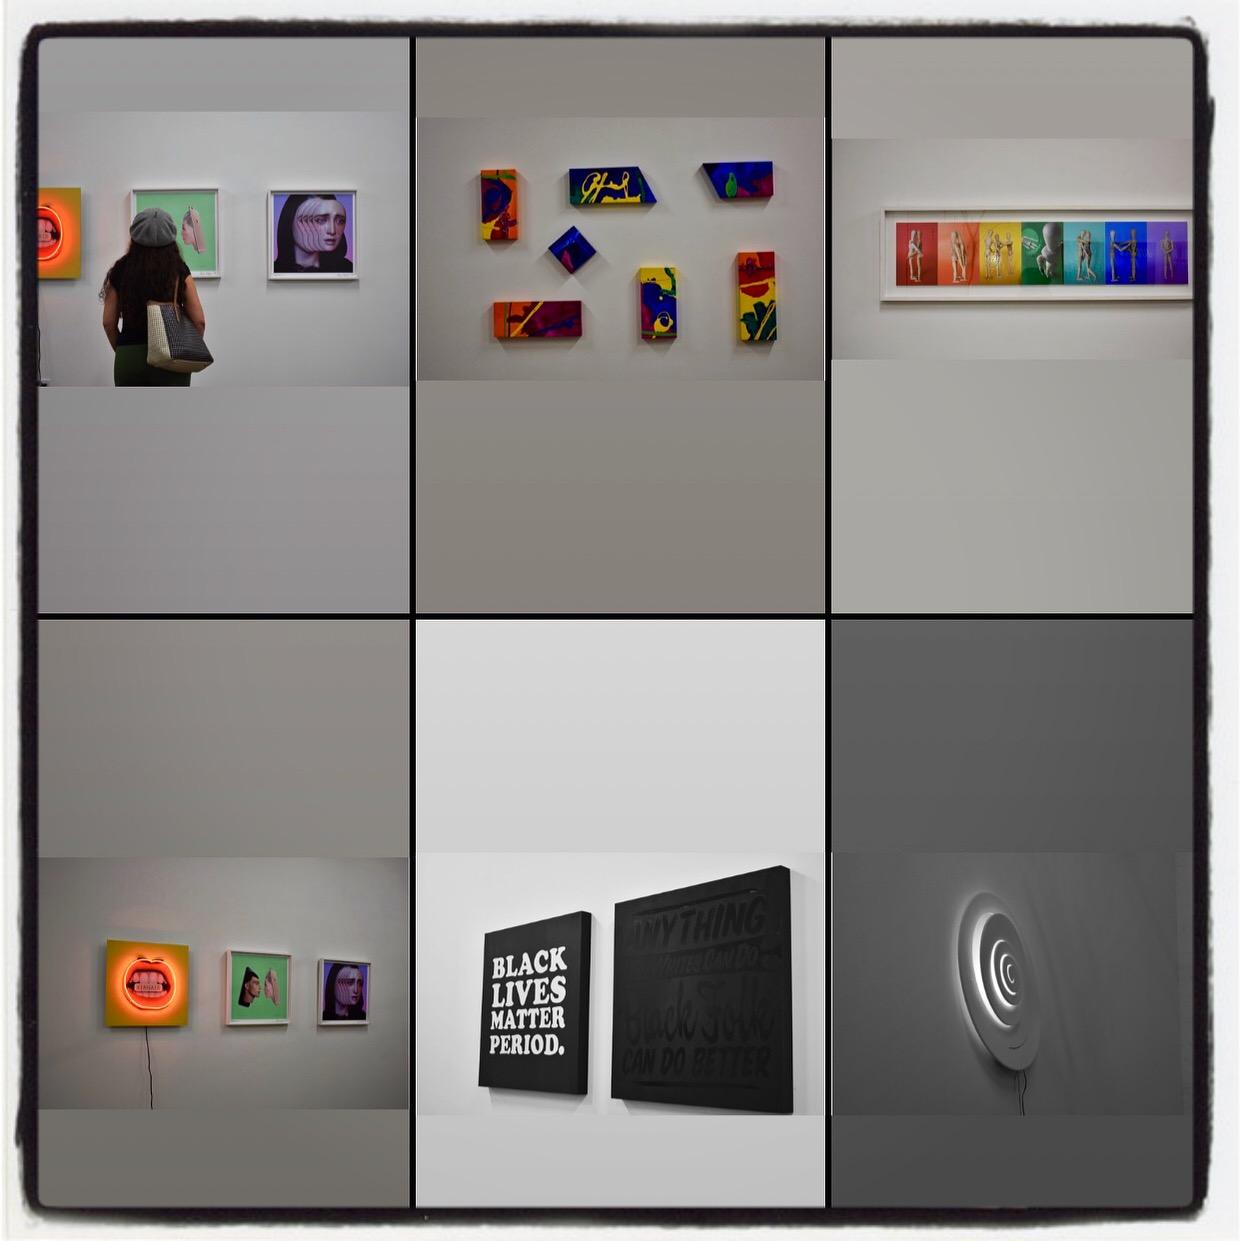 d | a | c art space -